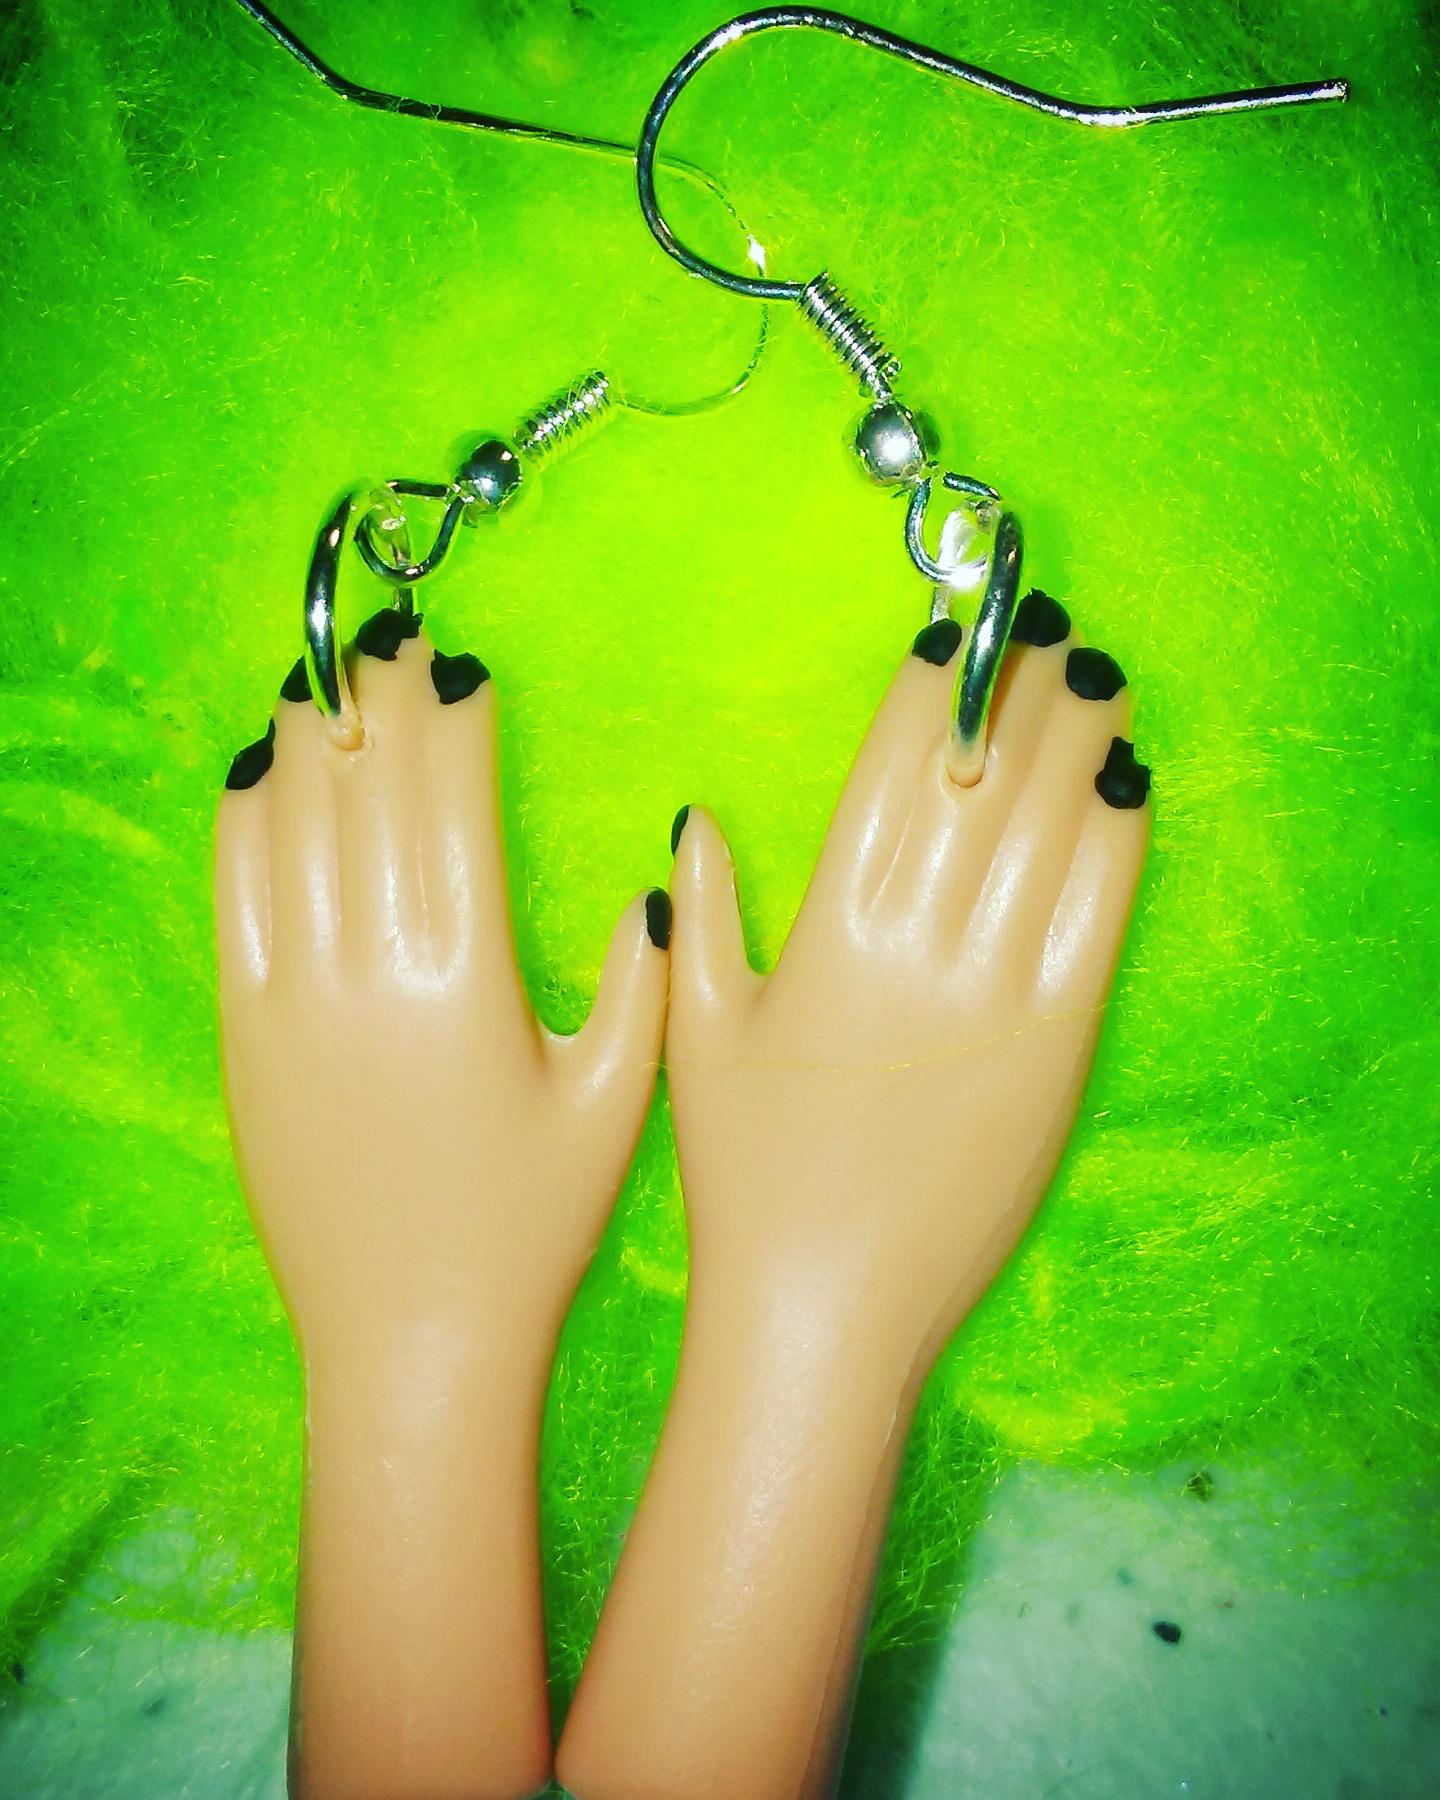 Barbie Nail Art Games Free Download: Barbie Hand Earrings On Storenvy